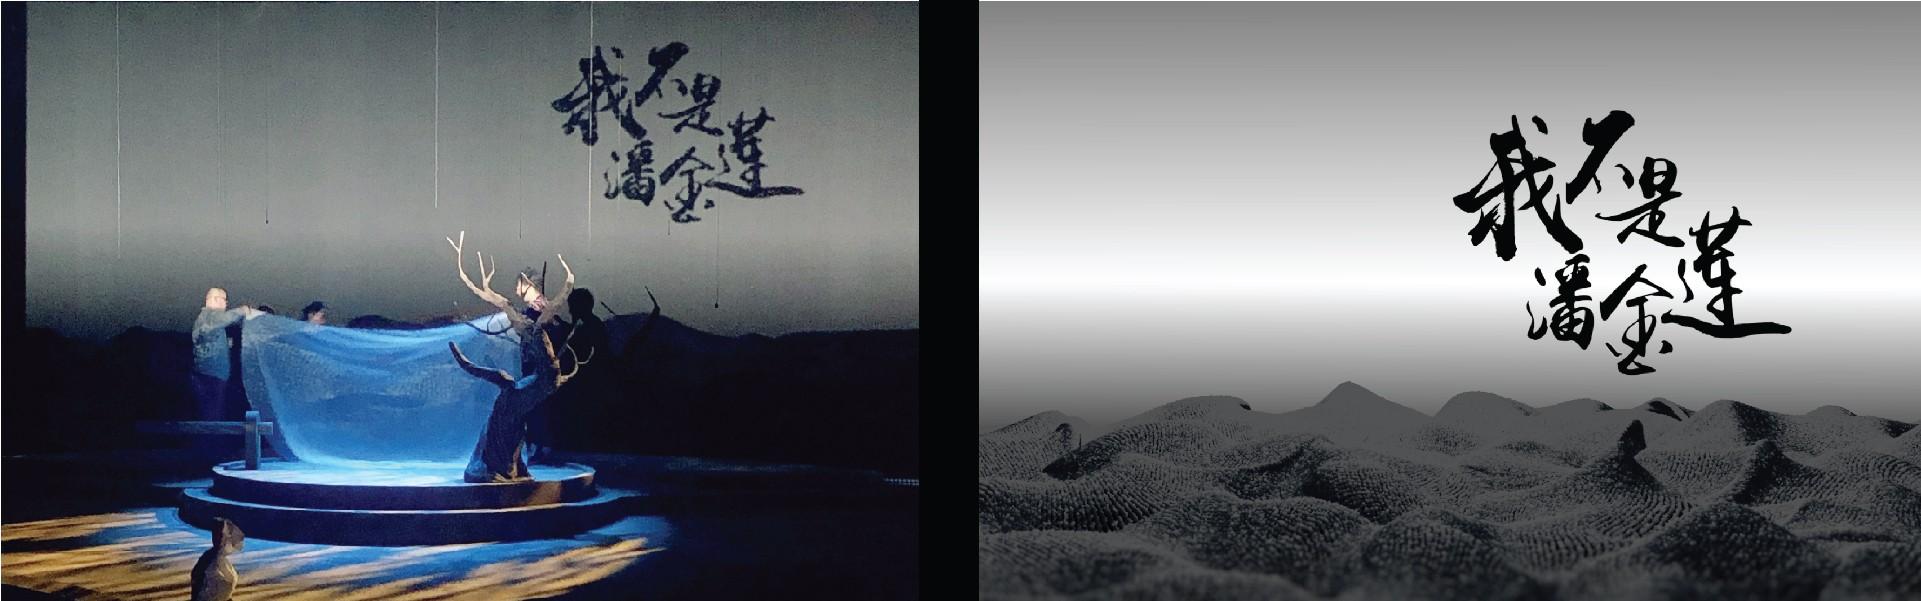 Untitled-1-13